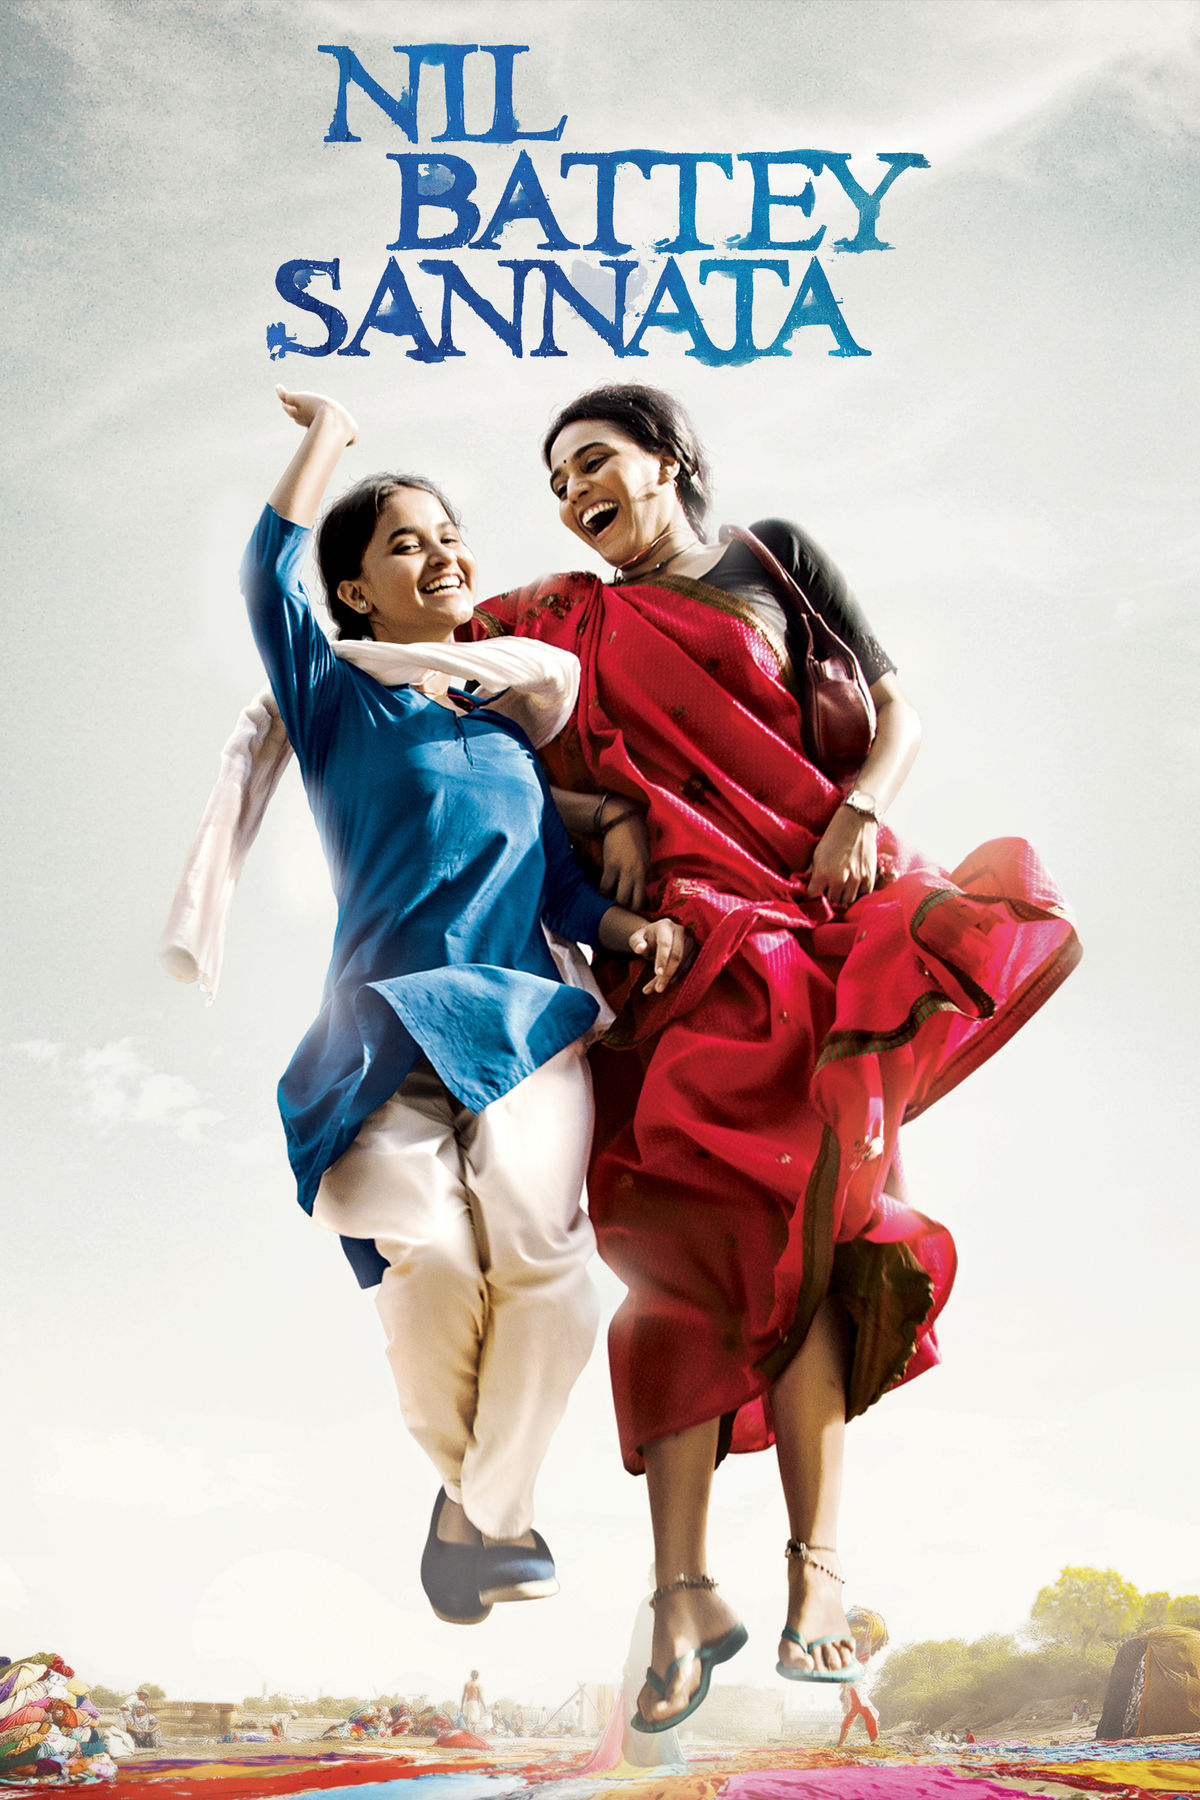 Swara Bhaskar Best Movies, TV Shows and Web Series List